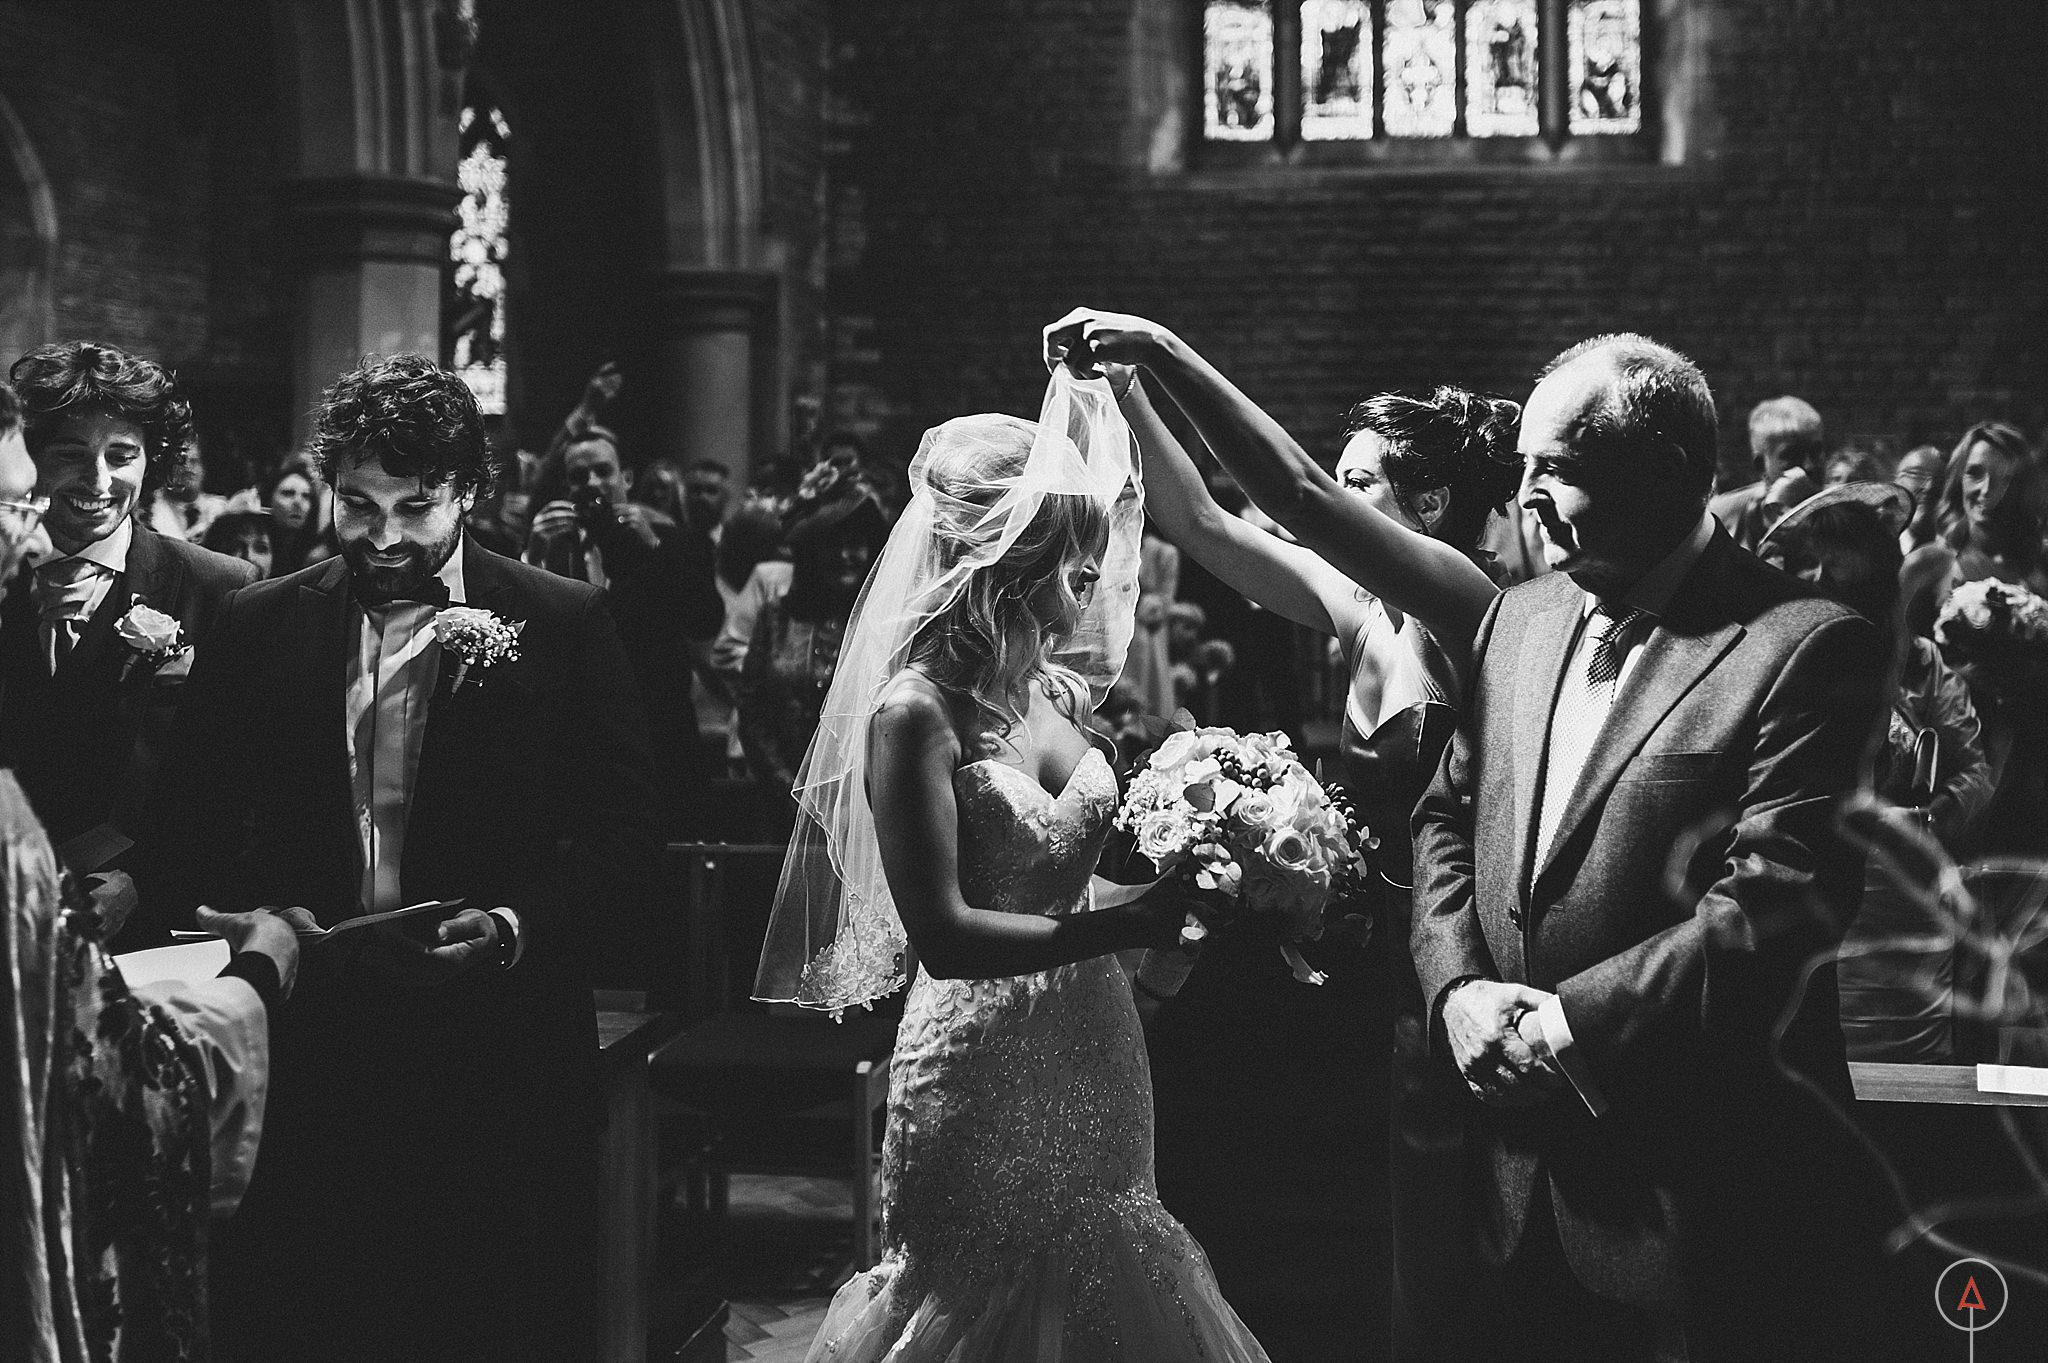 cardiff-wedding-photographer-aga-tomaszek_0363